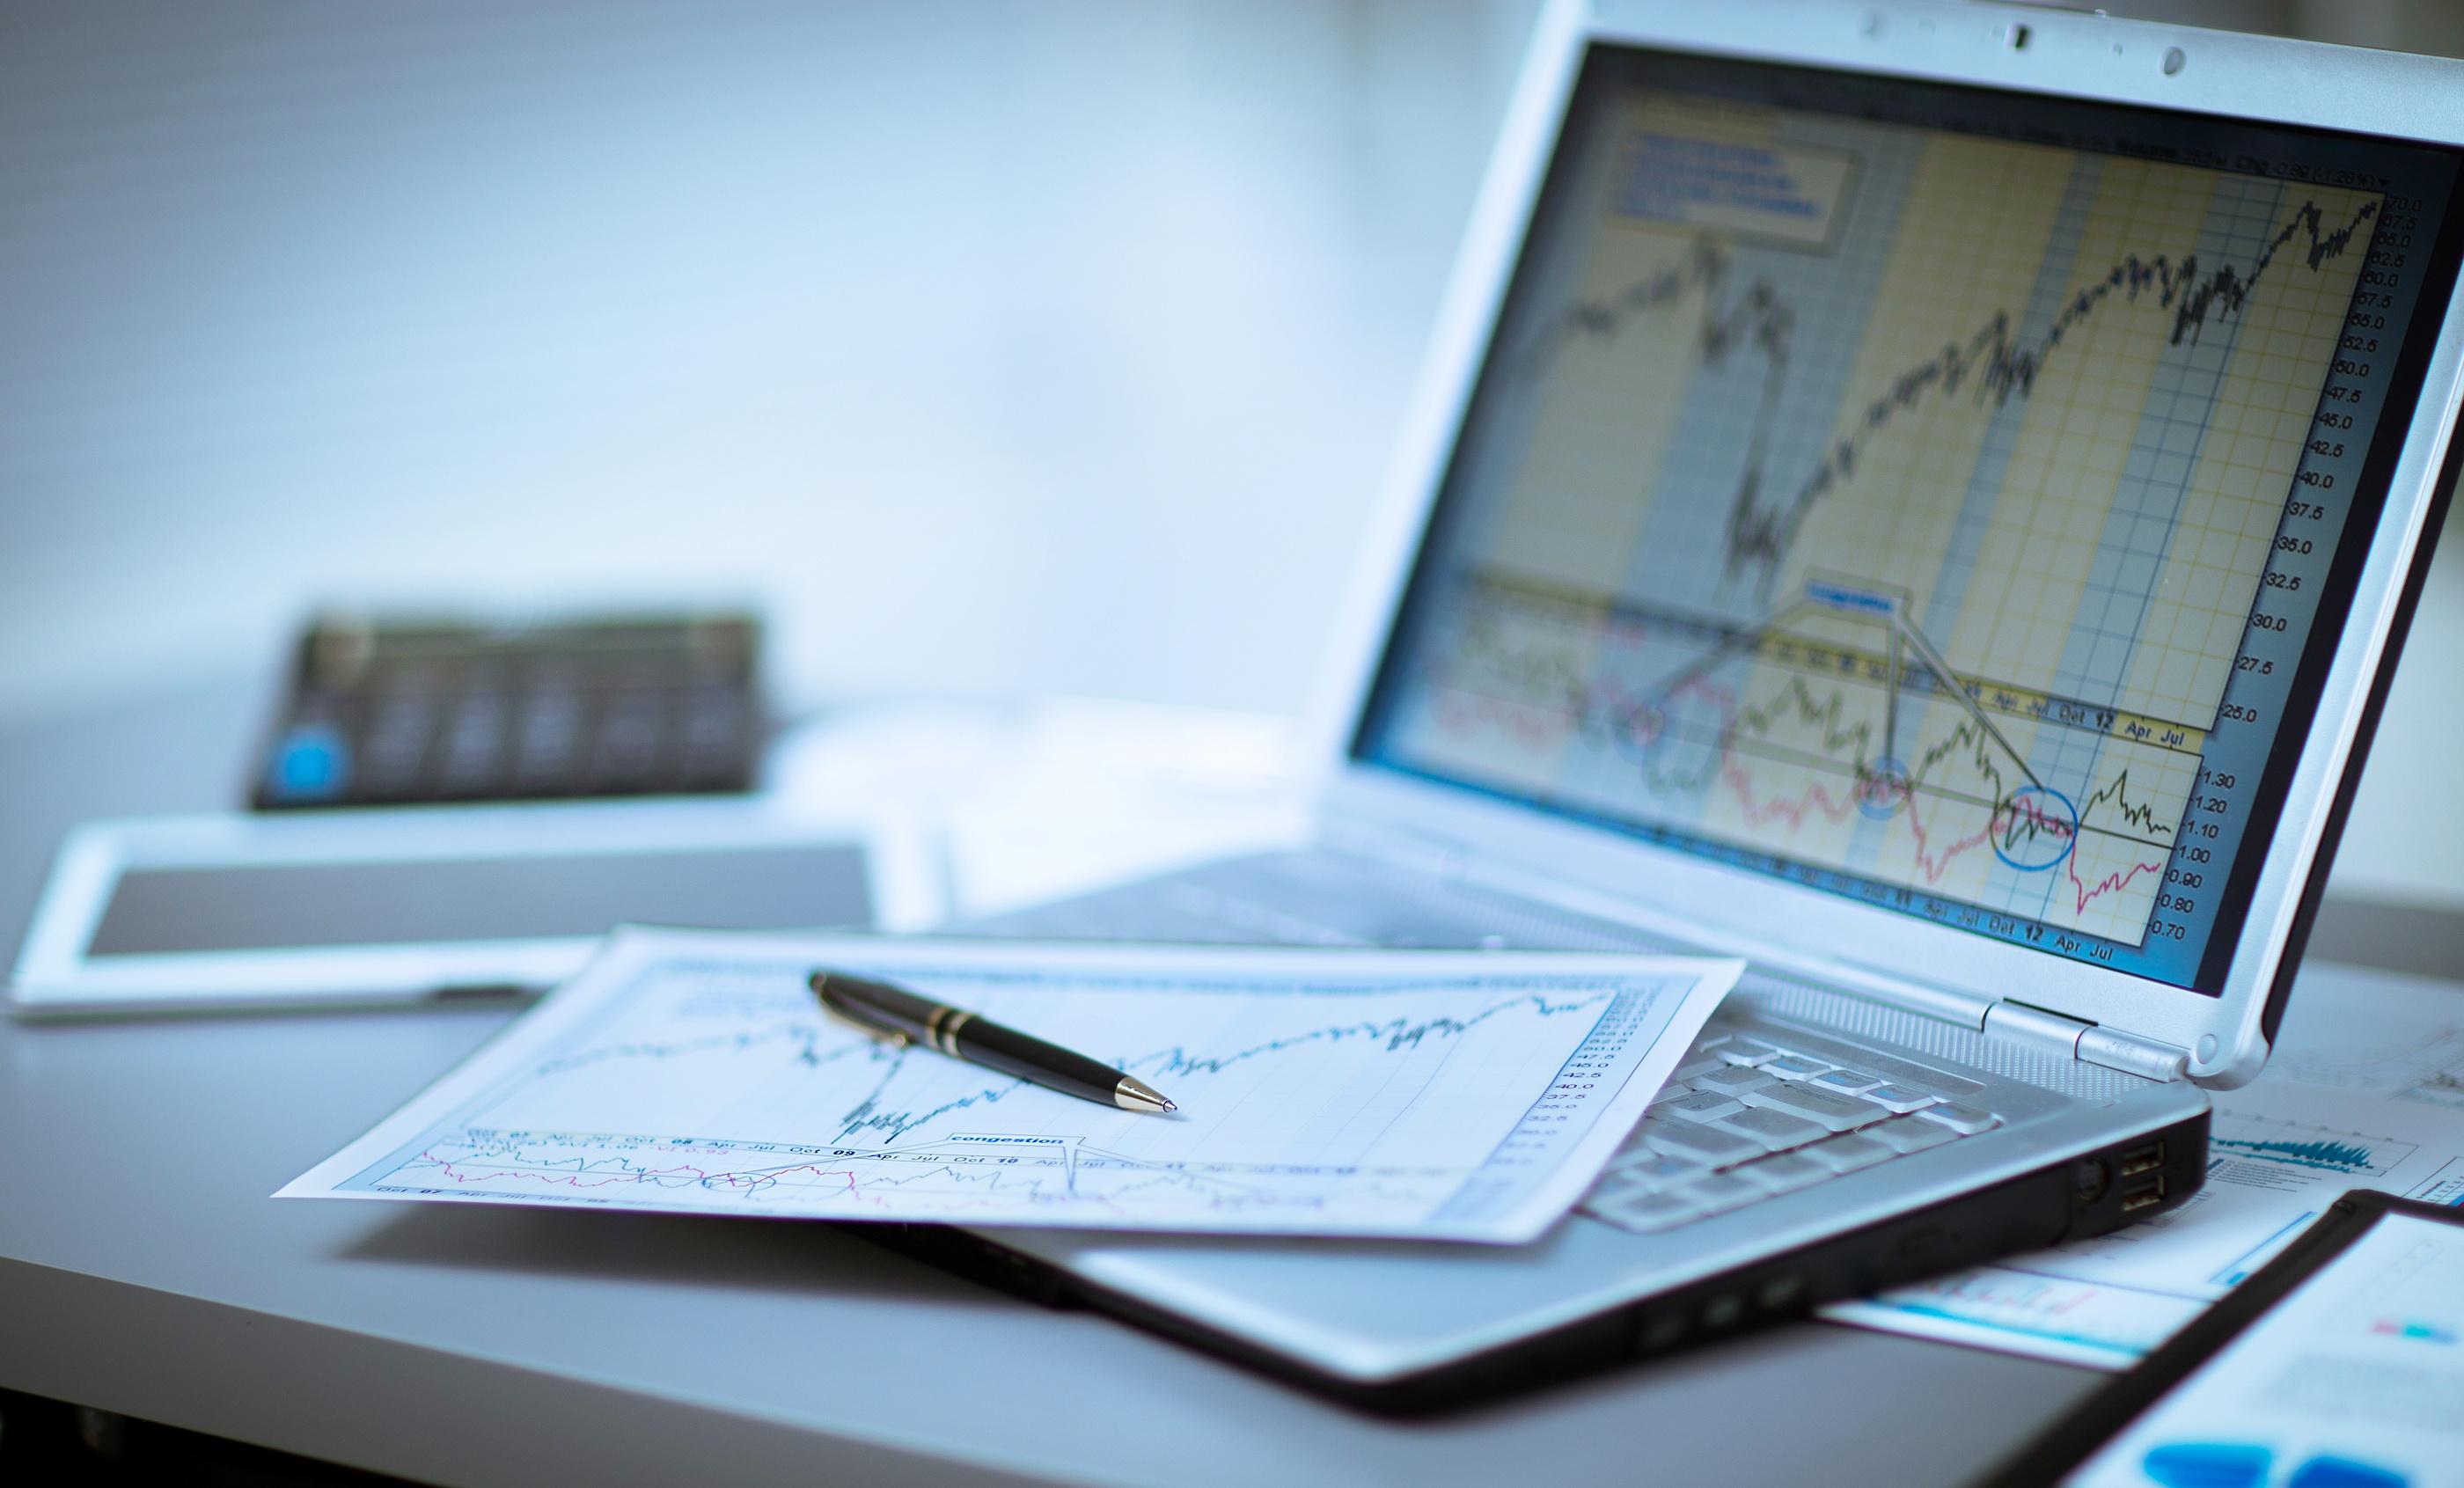 bigstock-Businessman-analyzing-investme-86638058.jpg